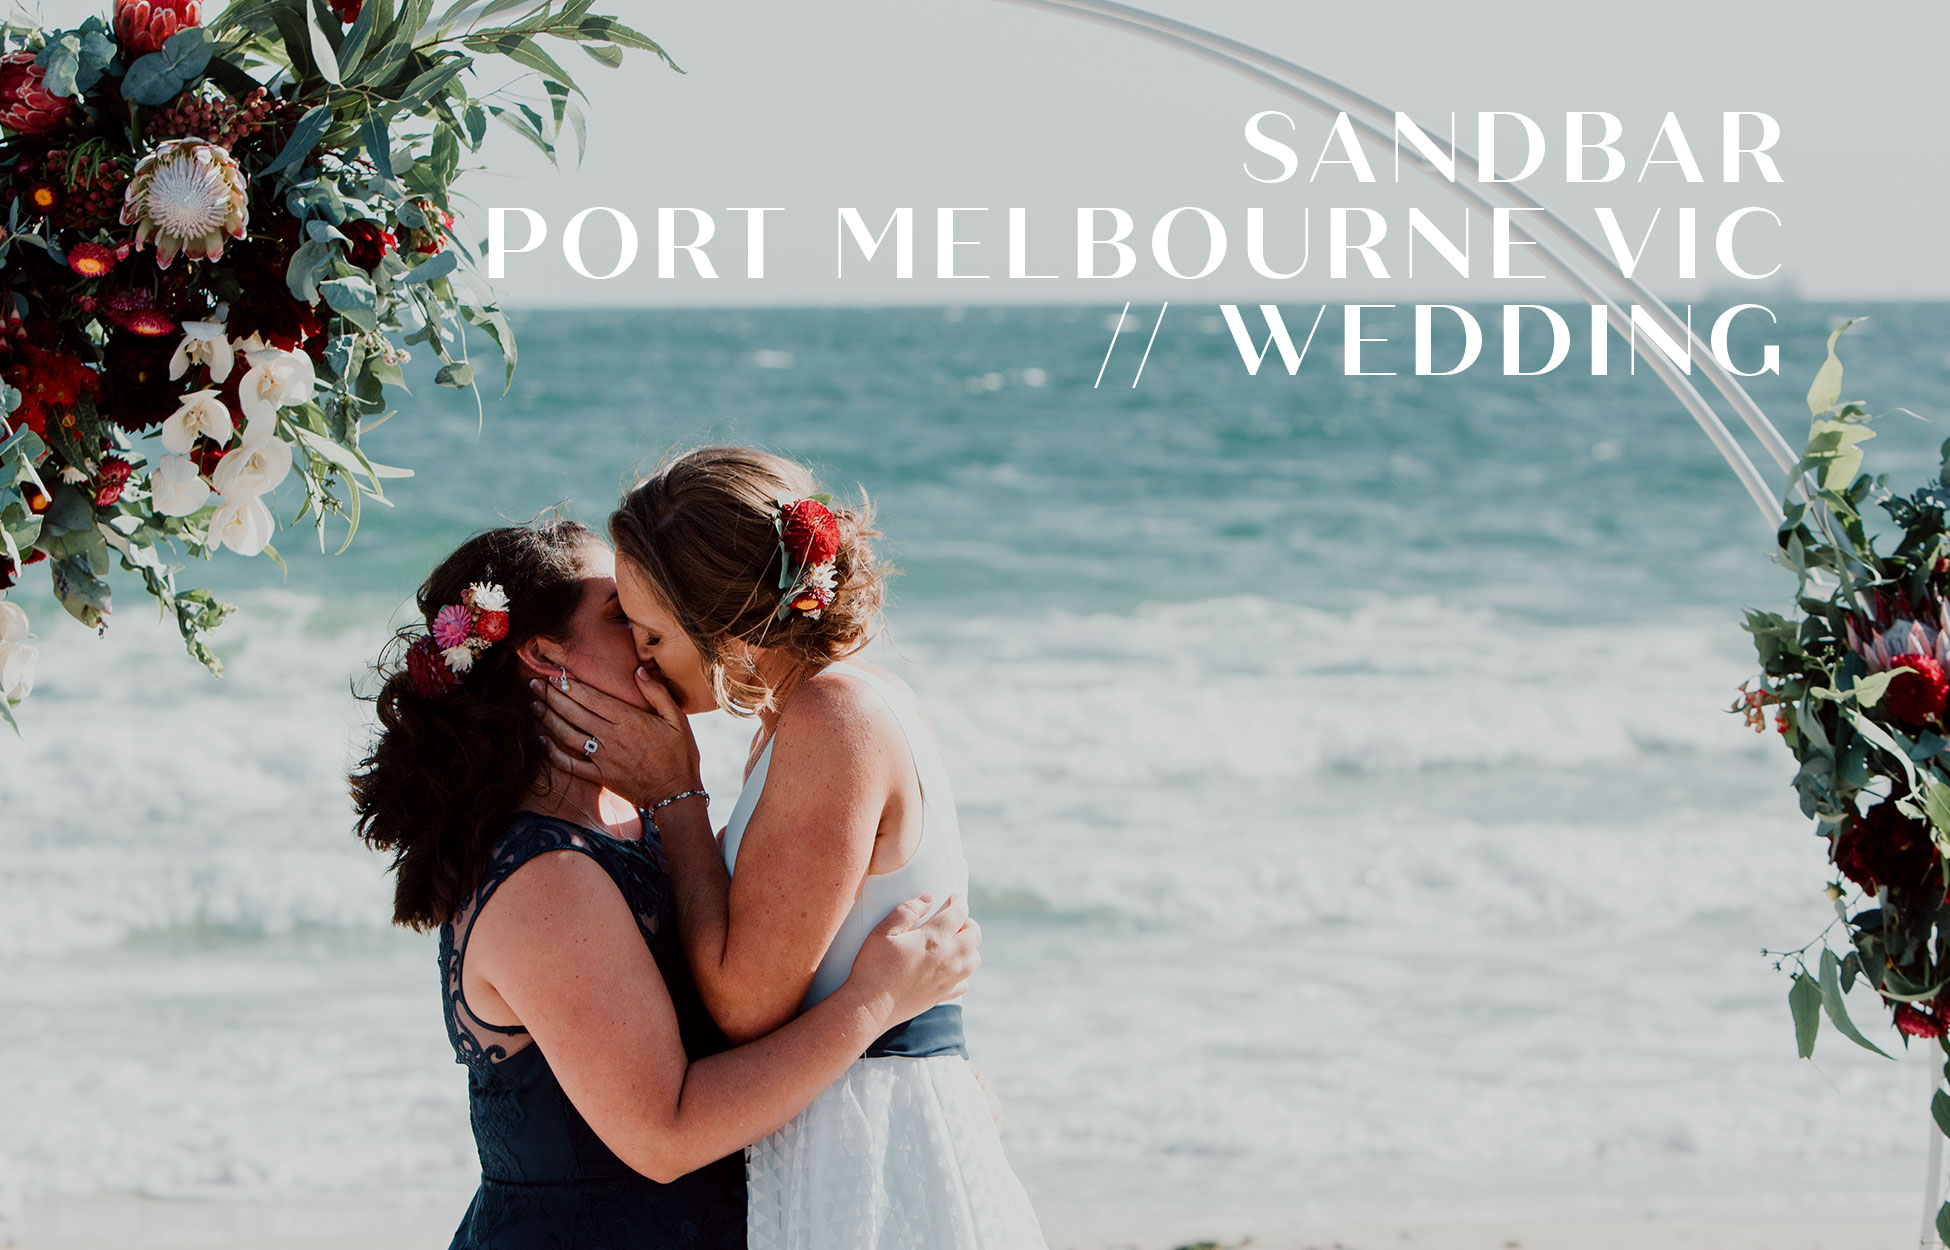 Wedding-photography-Sandbar-Port-Melbourne-VIC--Neil-Hole-Photography